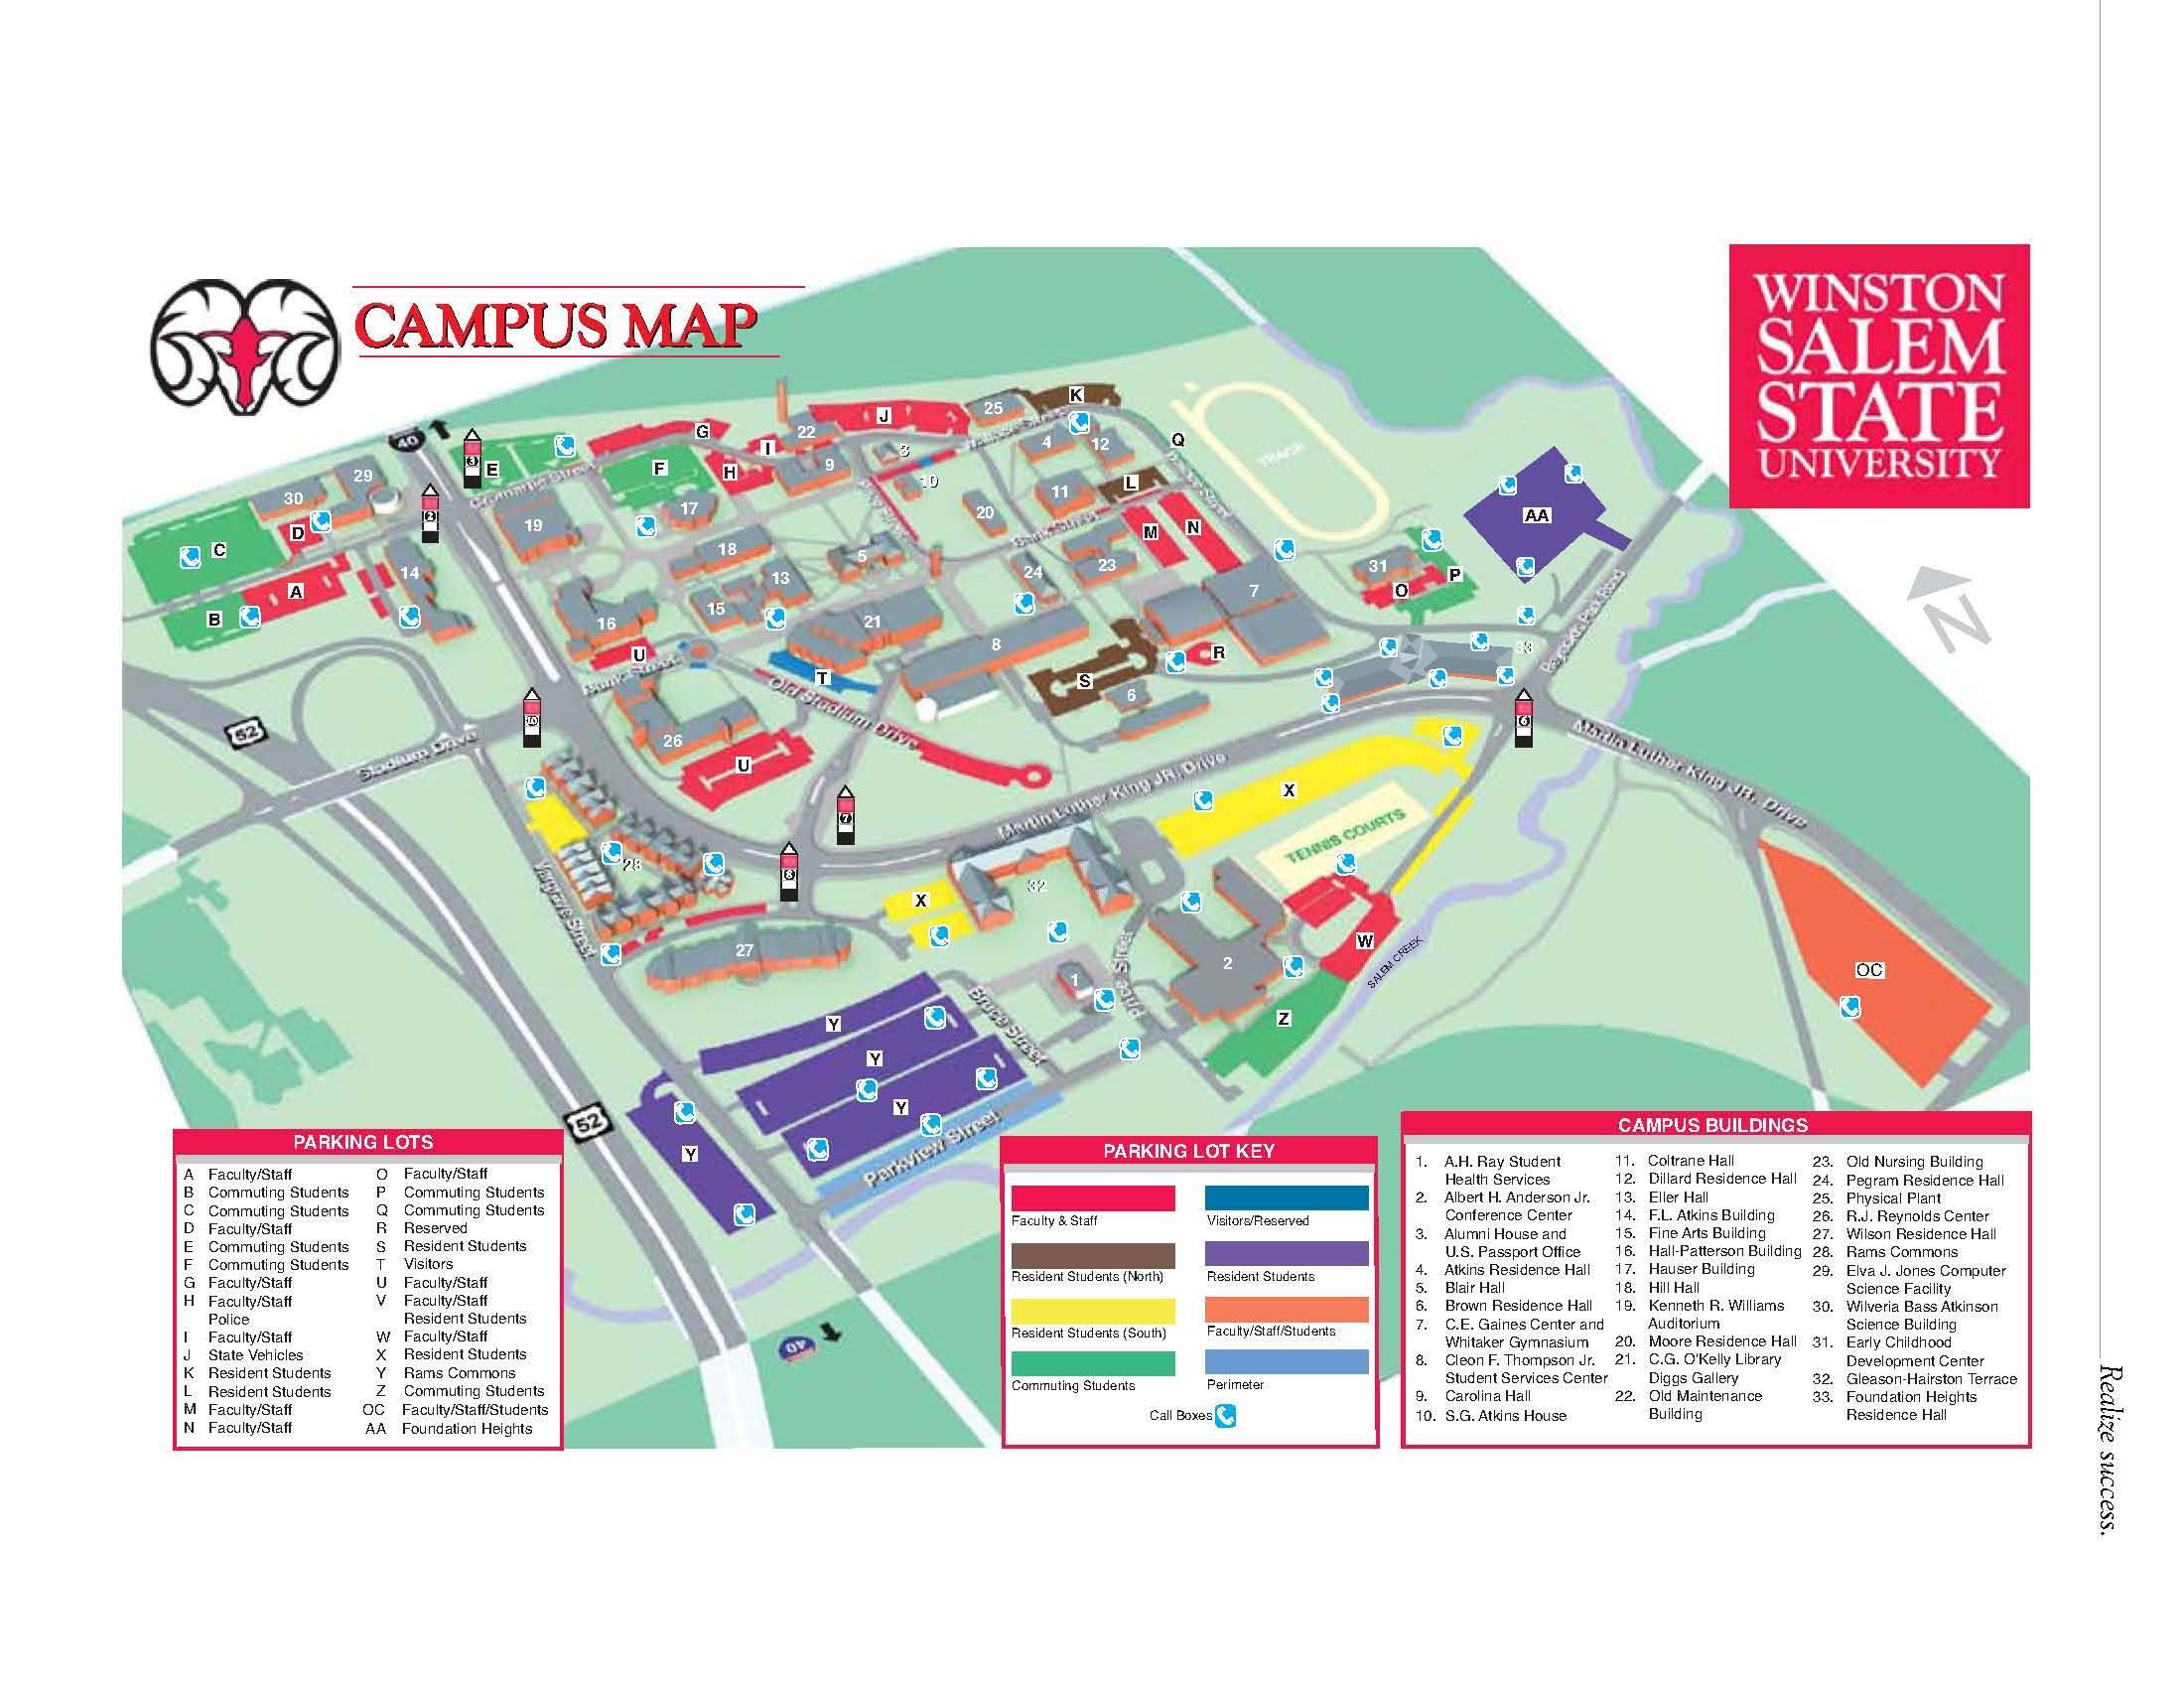 Alcorn State University Campus Map | Metro Map on au campus map, ul campus map, ou campus map, ui campus map, ur campus map, uc campus map, uk campus map, cf campus map, wb campus map, um campus map, ge campus map, se campus map, uo campus map, uw campus map, ms campus map, du campus map, ut campus map, st campus map, fh campus map, qu campus map,